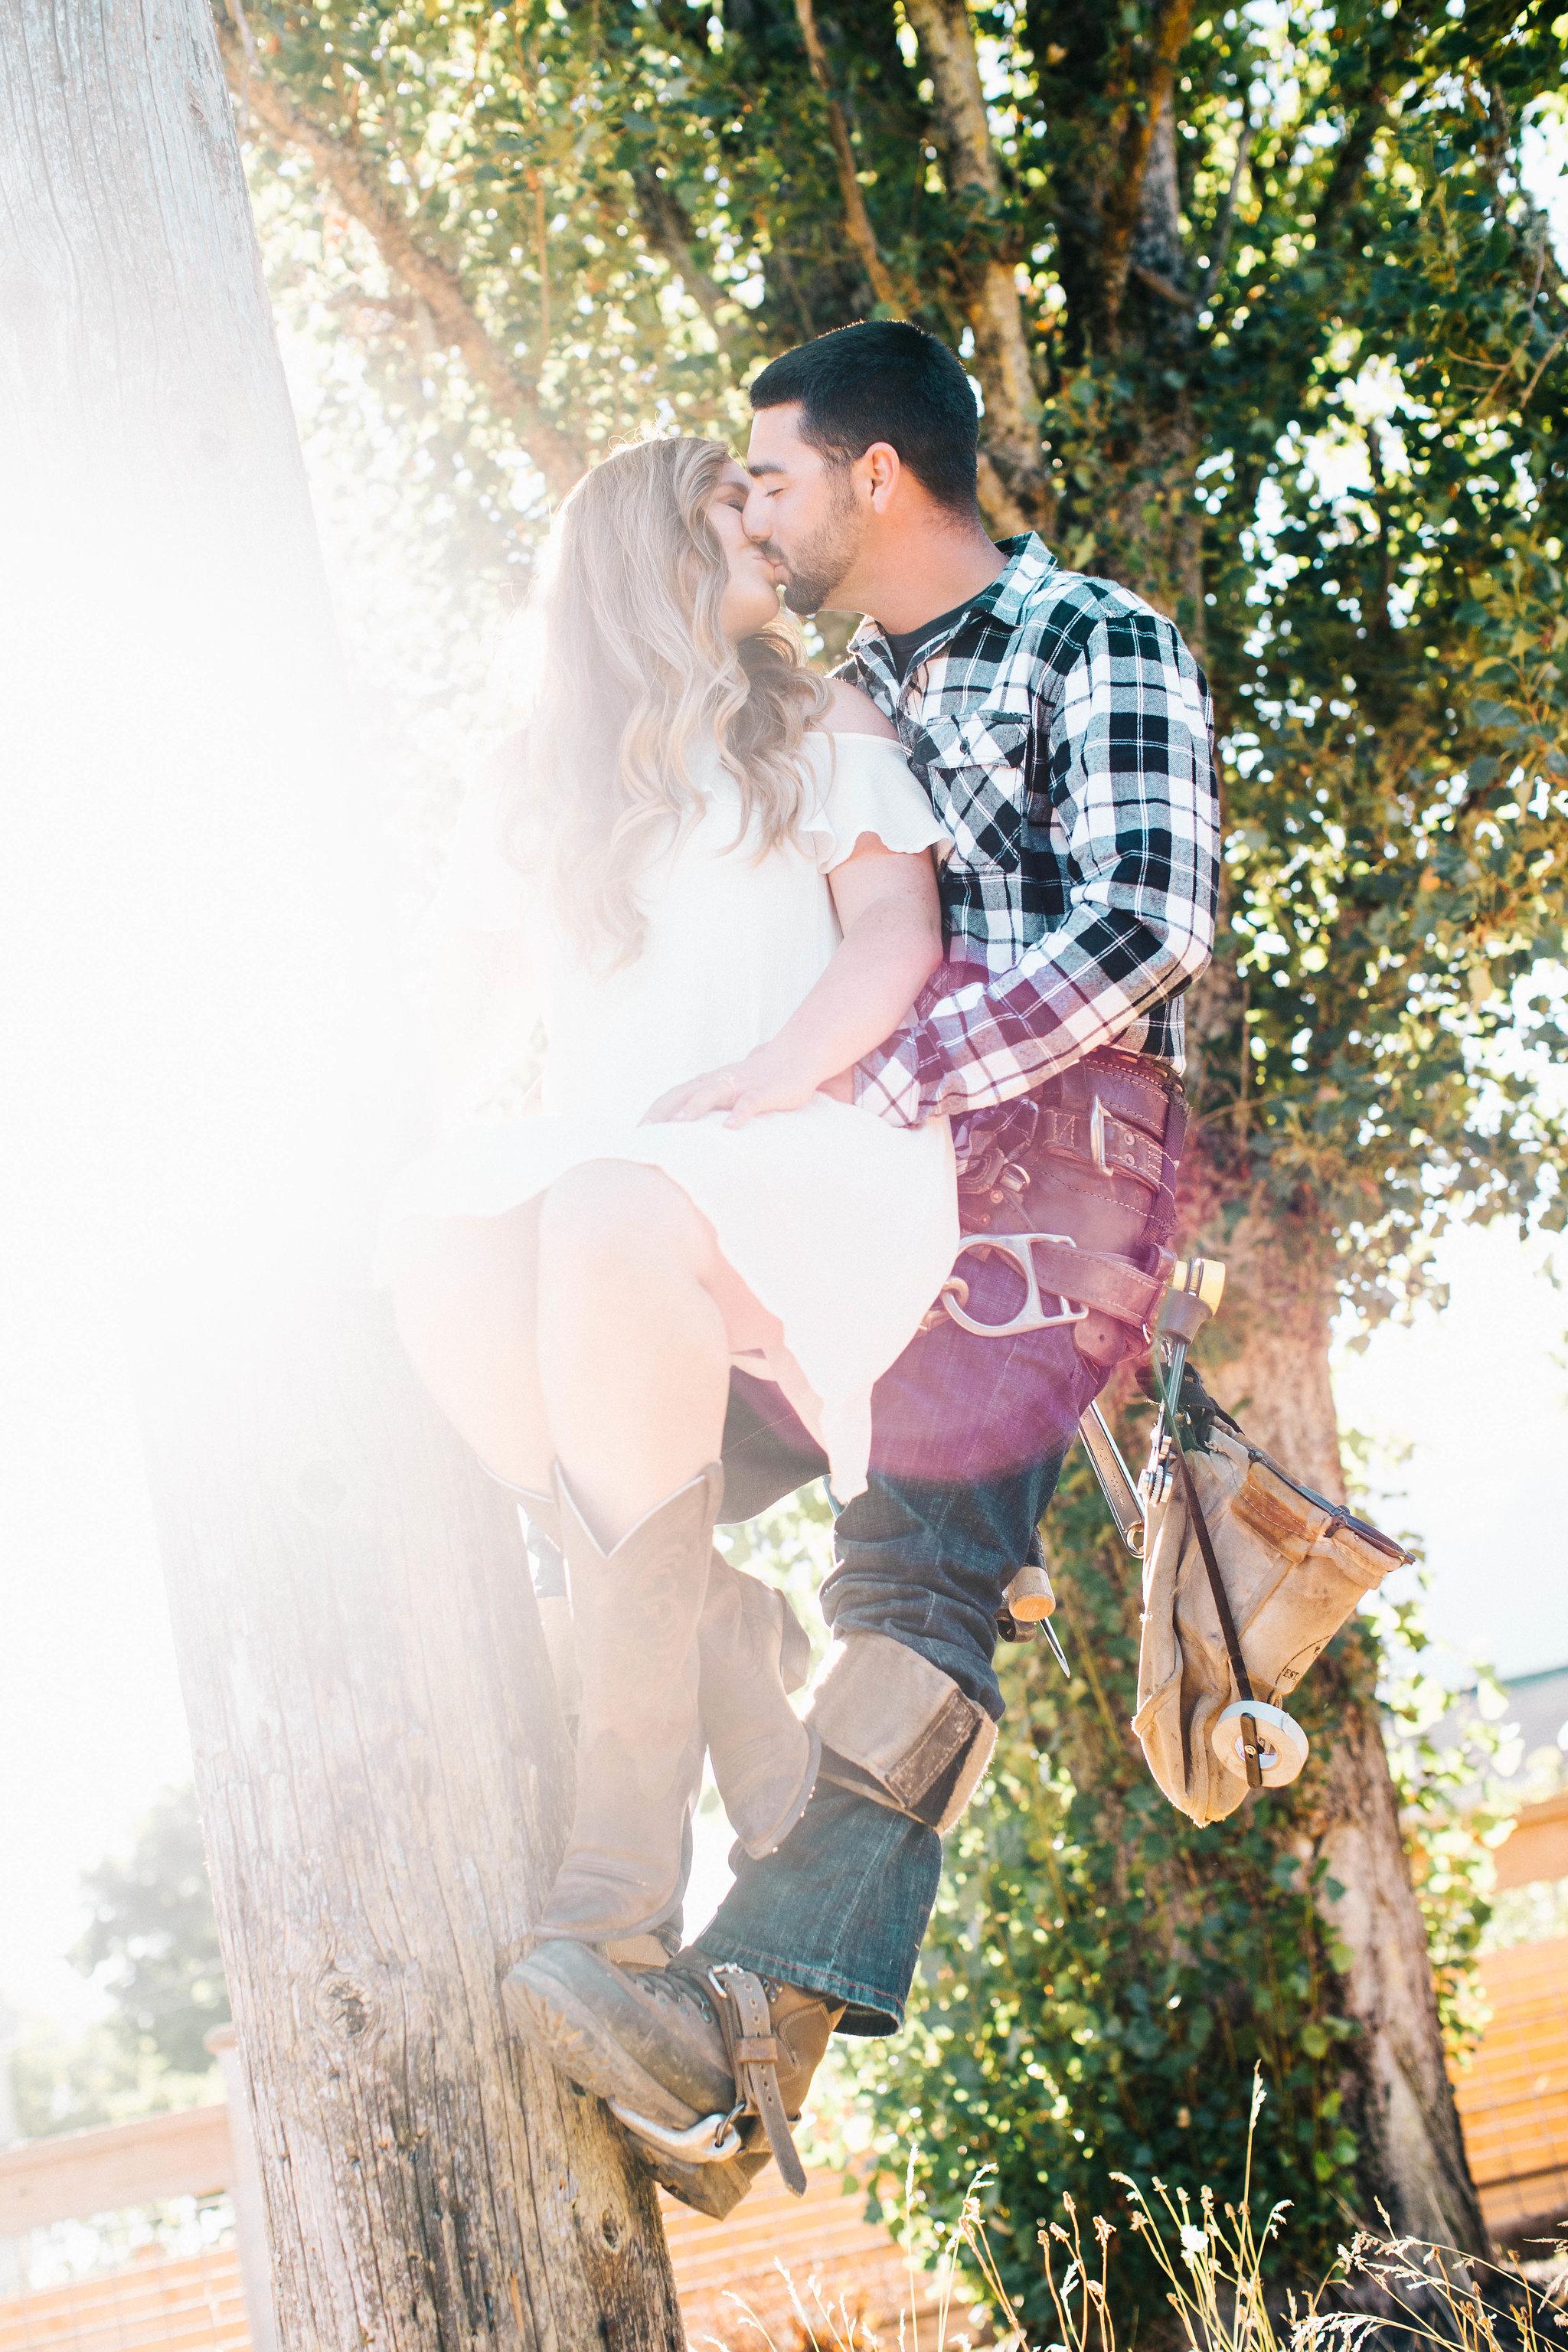 Discovery_Park_Engagement_Seattle_by_Adina_Preston_Weddings_8.jpg